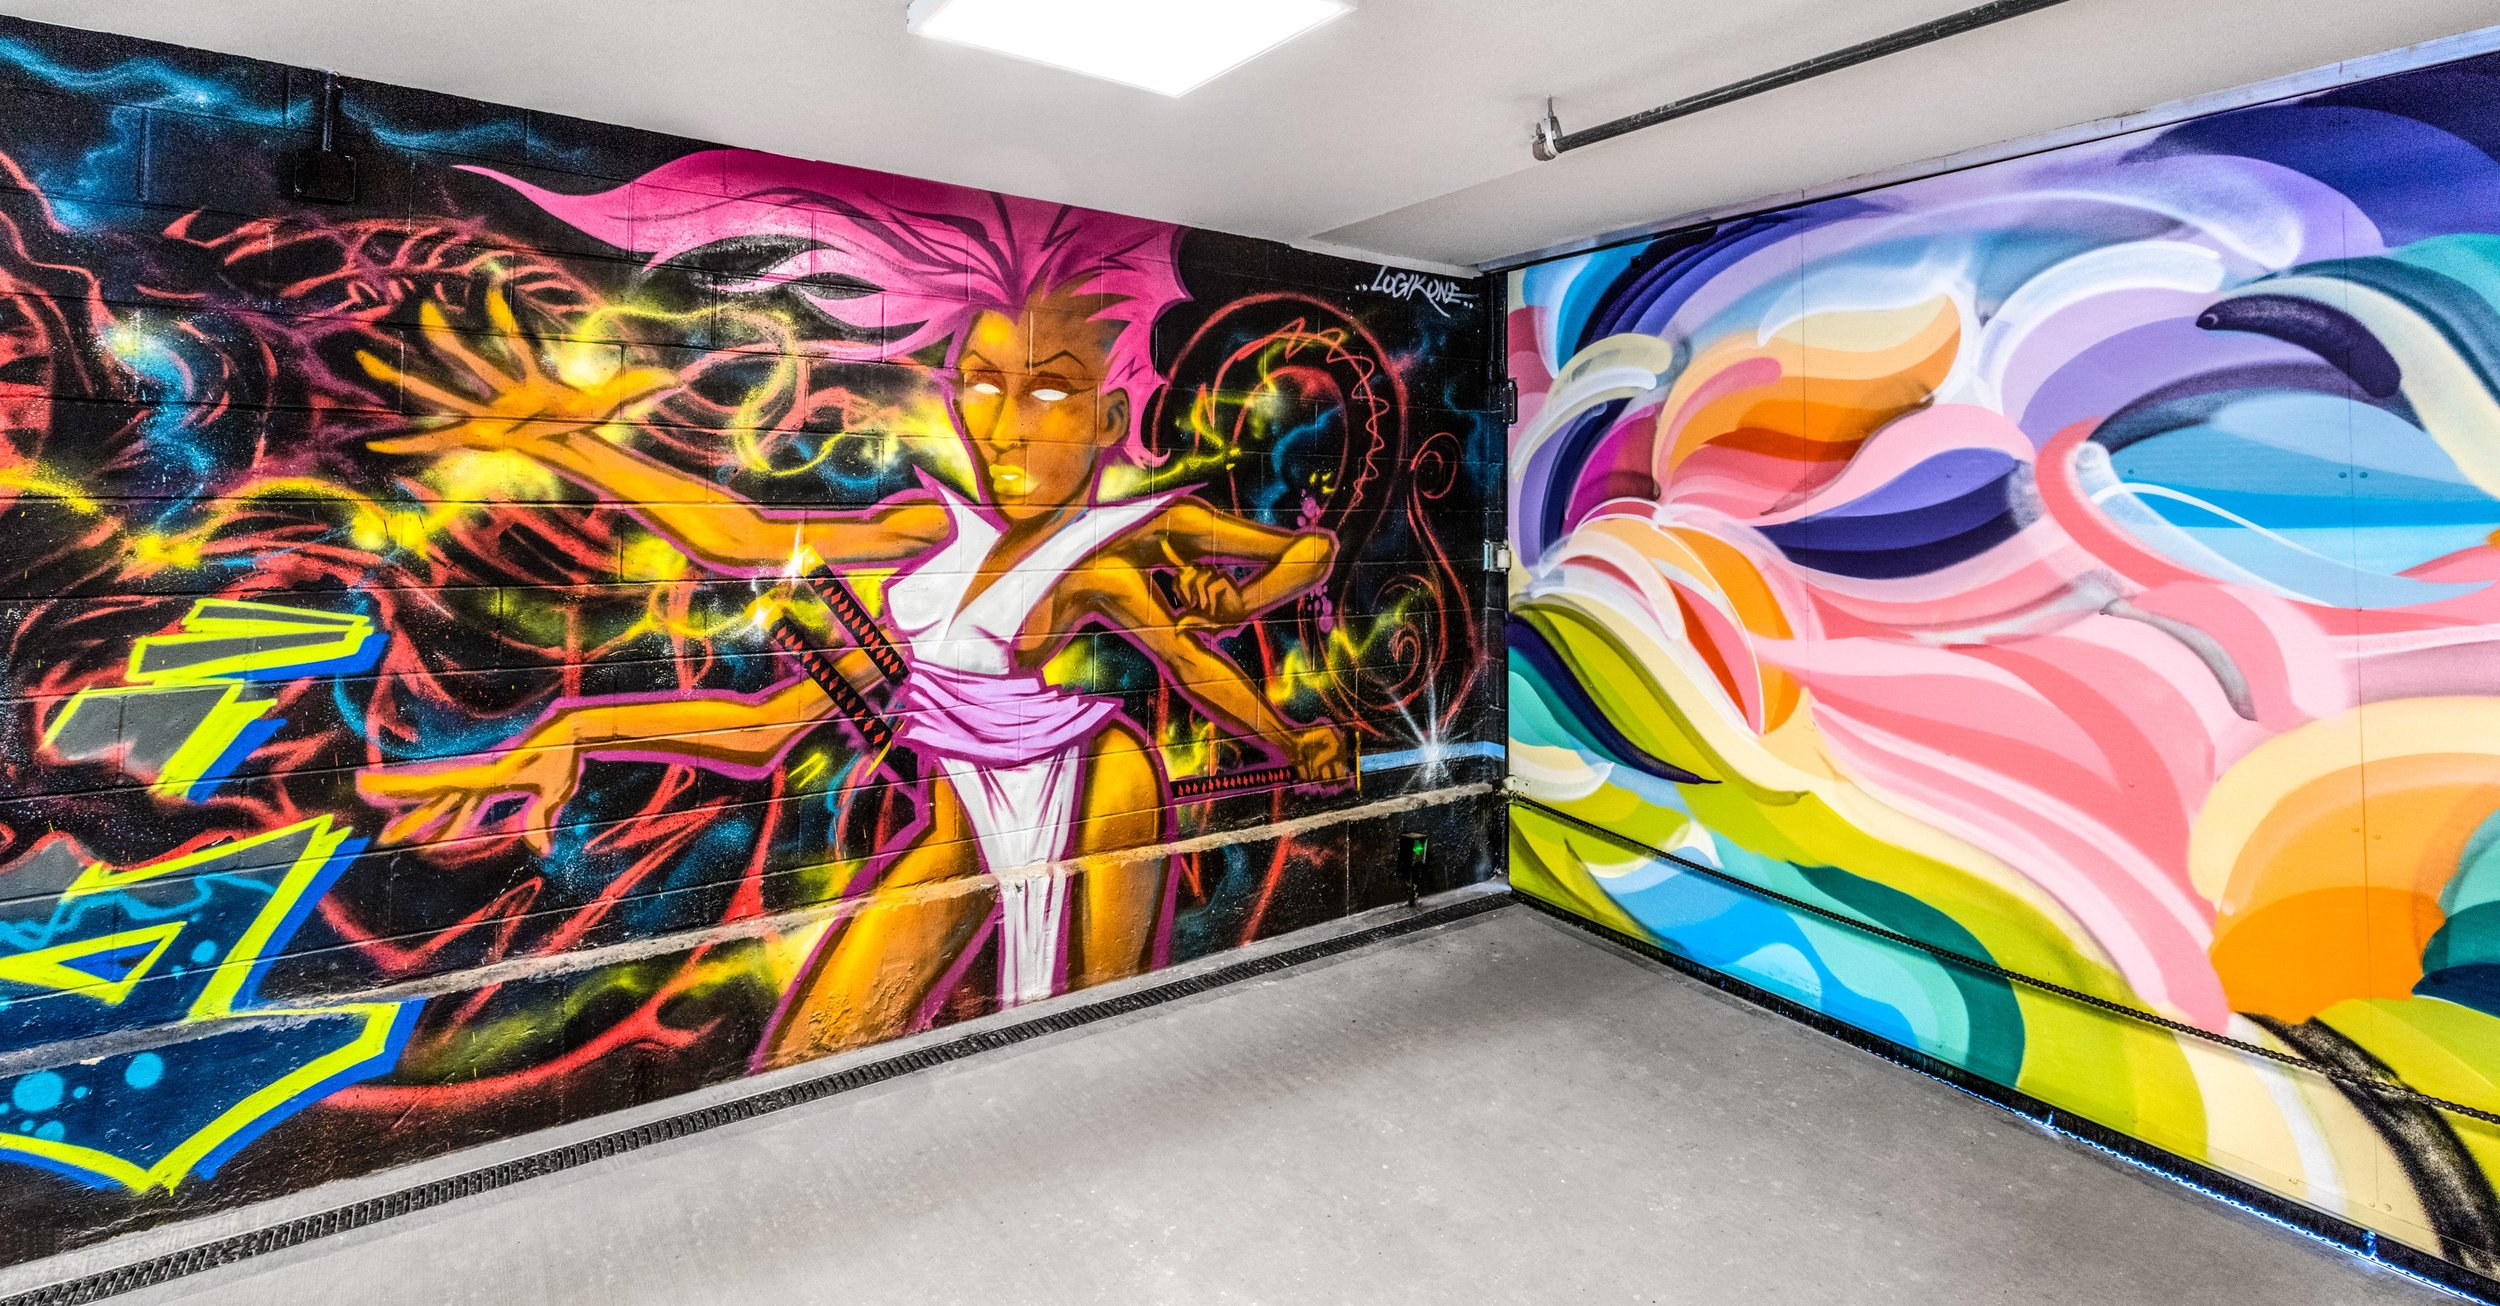 Graffiti House 7 - photo by Max Touhey.jpg